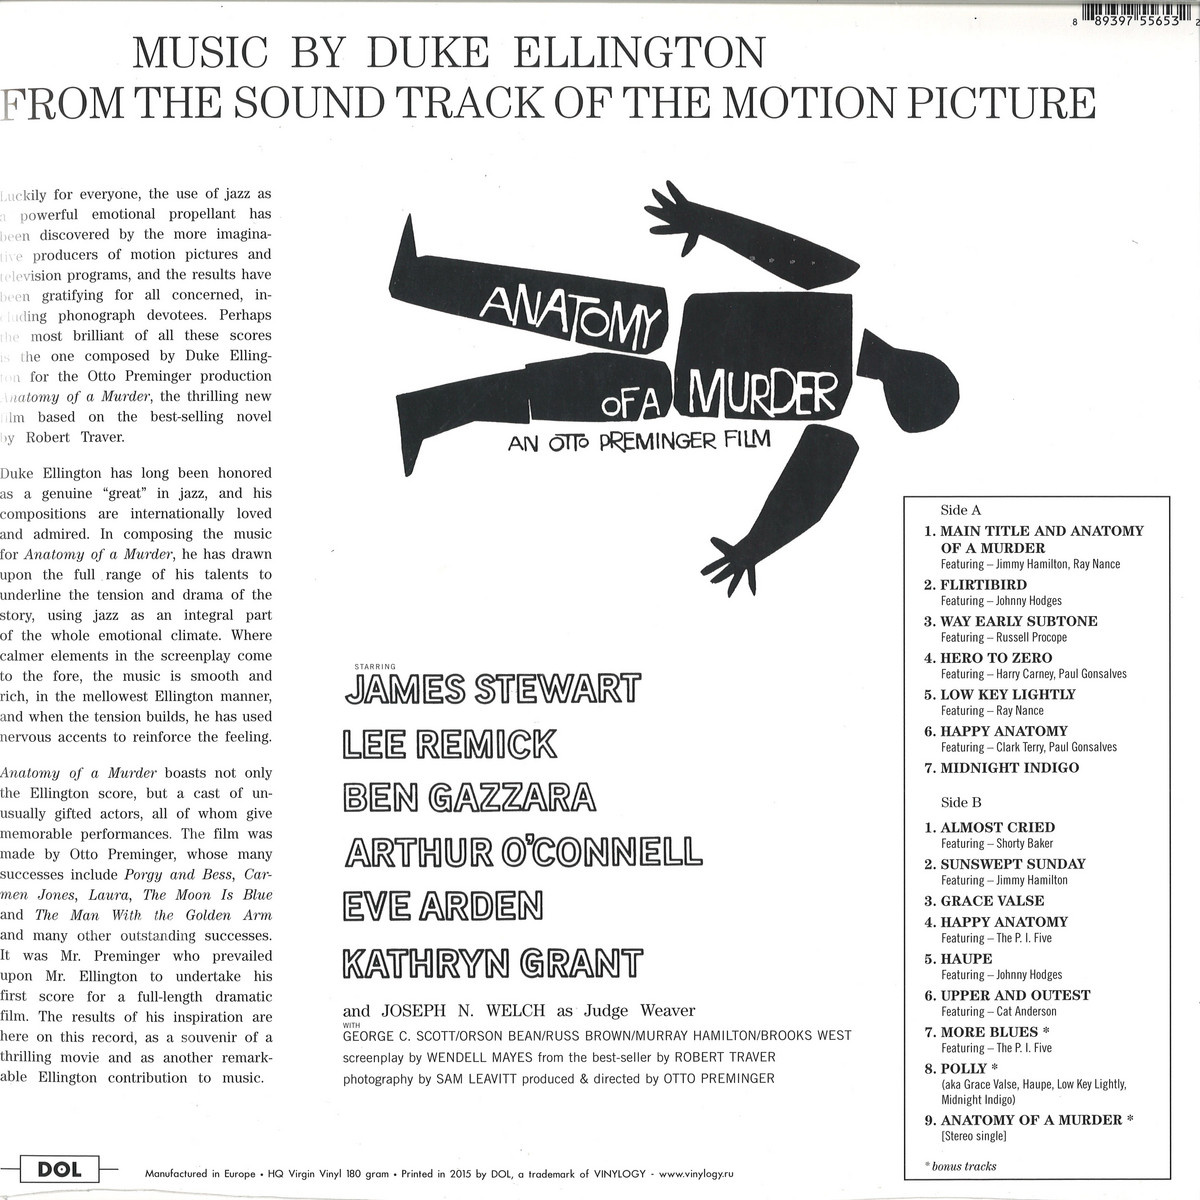 Duke Ellington / Original Score - Anatomy Of A Murder / DOL DOST653H ...